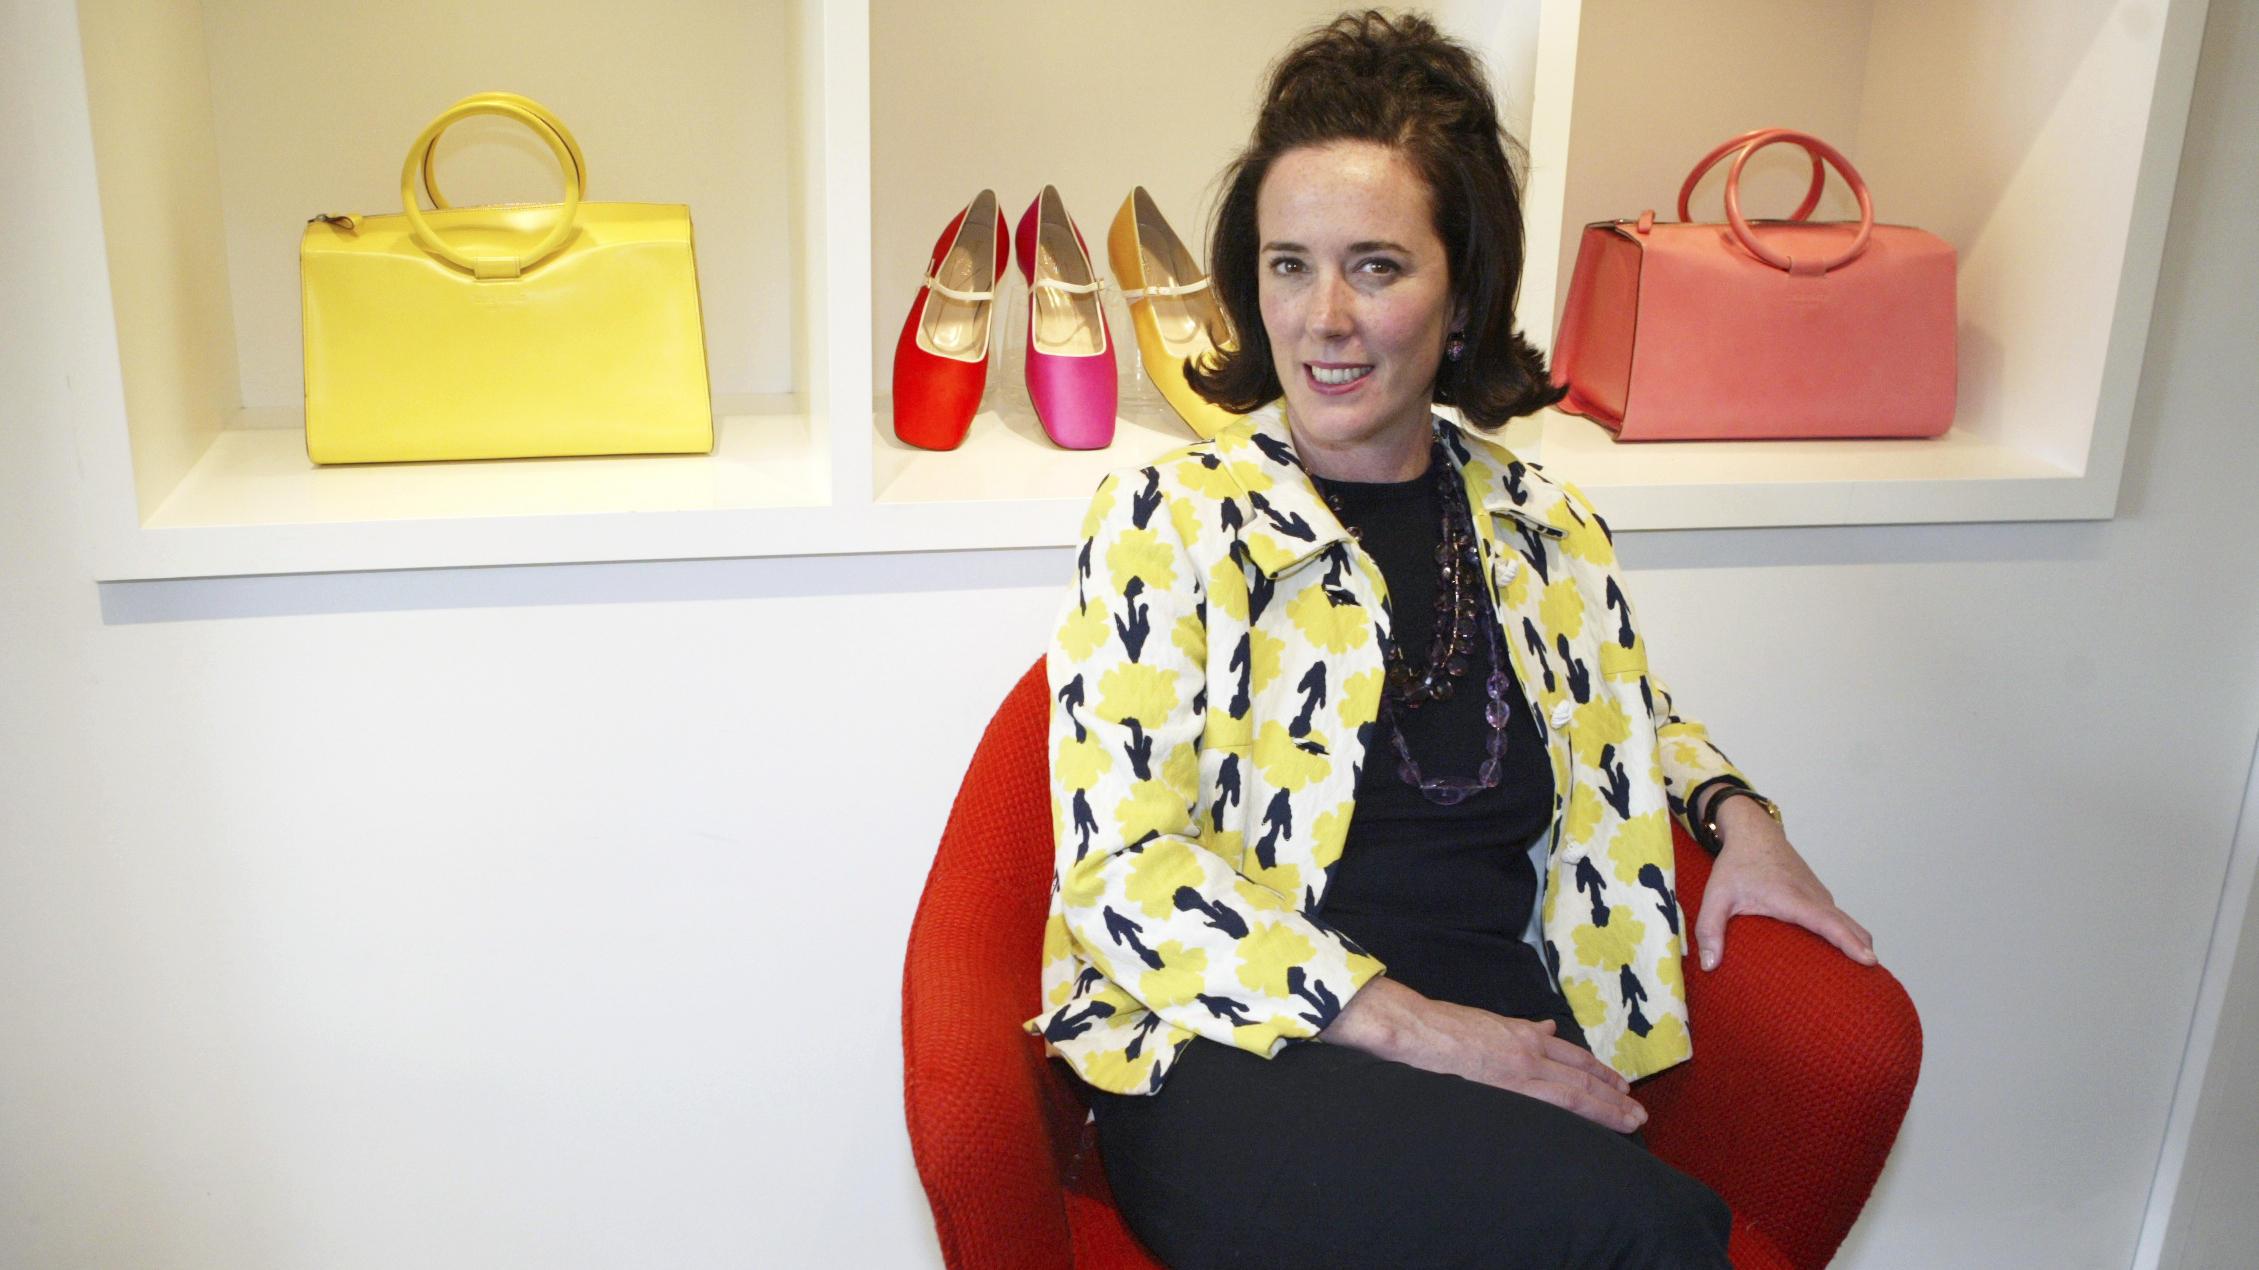 Designer Kate Spade Found Dead In New York At 55 Designer Kate Spade Found Dead In New York At 55 new foto